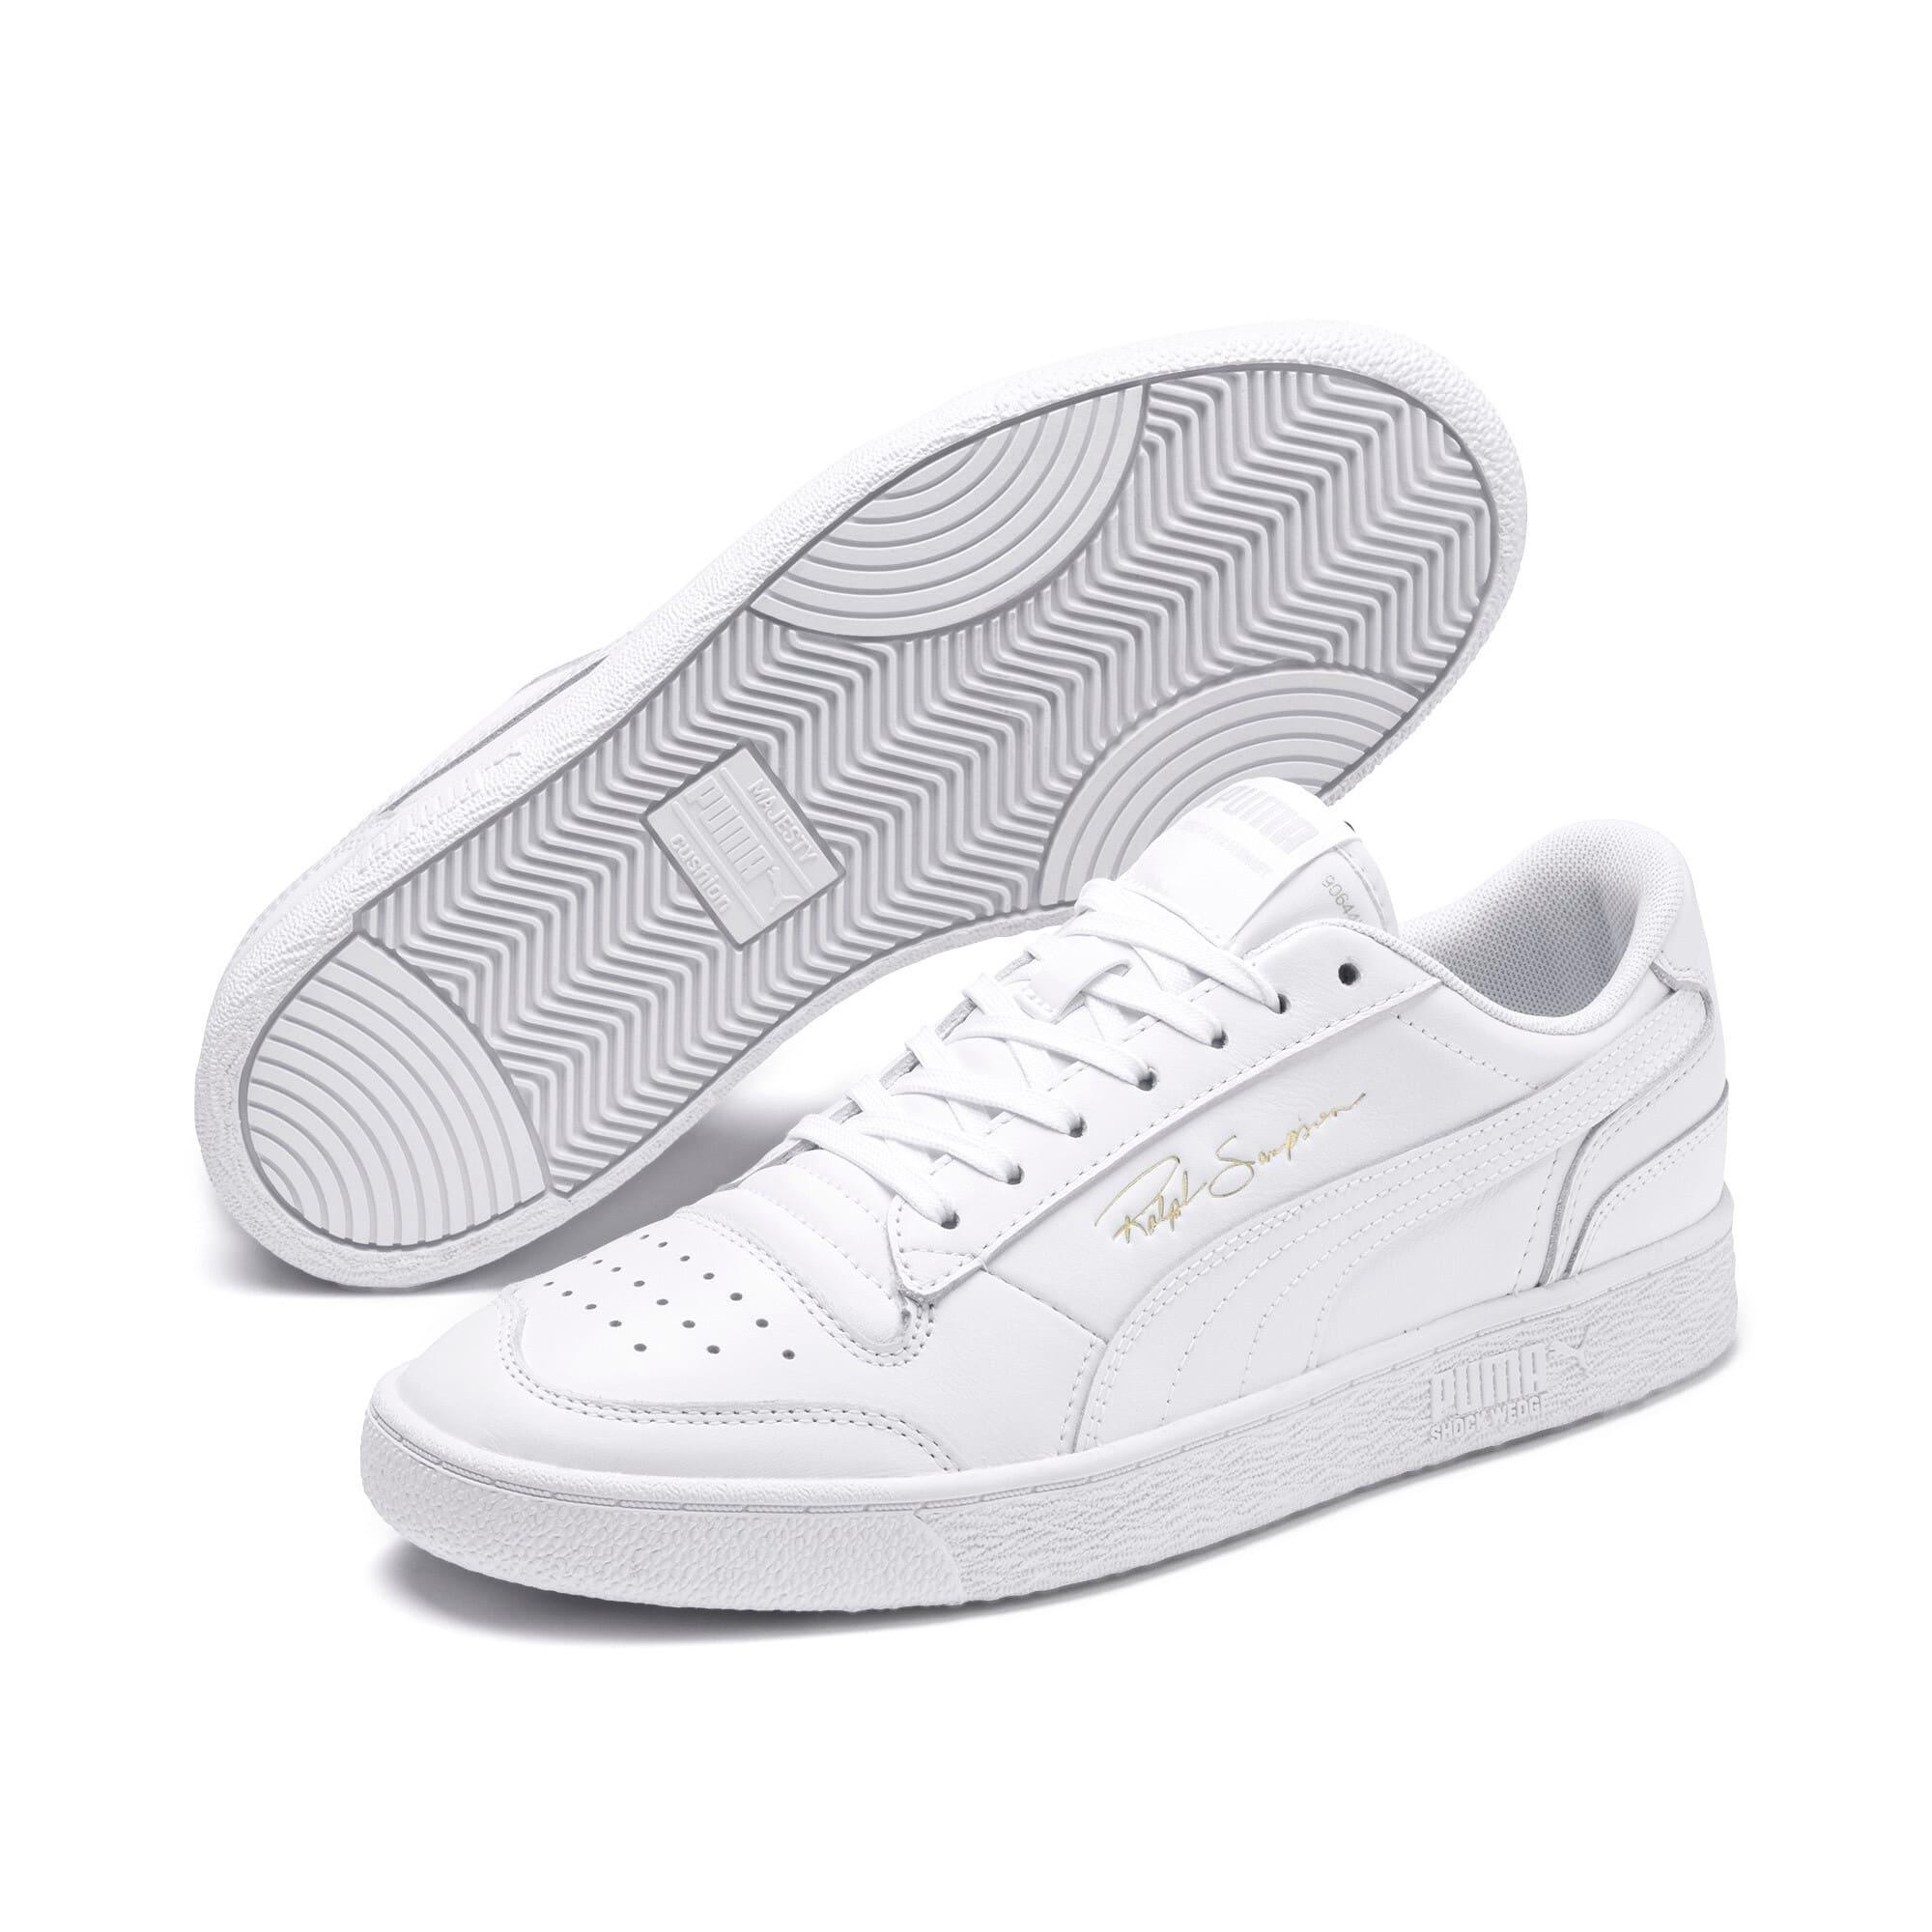 Thumbnail 3 of Ralph Sampson Lo Sneakers, Puma Wht-Puma Wht-Puma Wht, medium